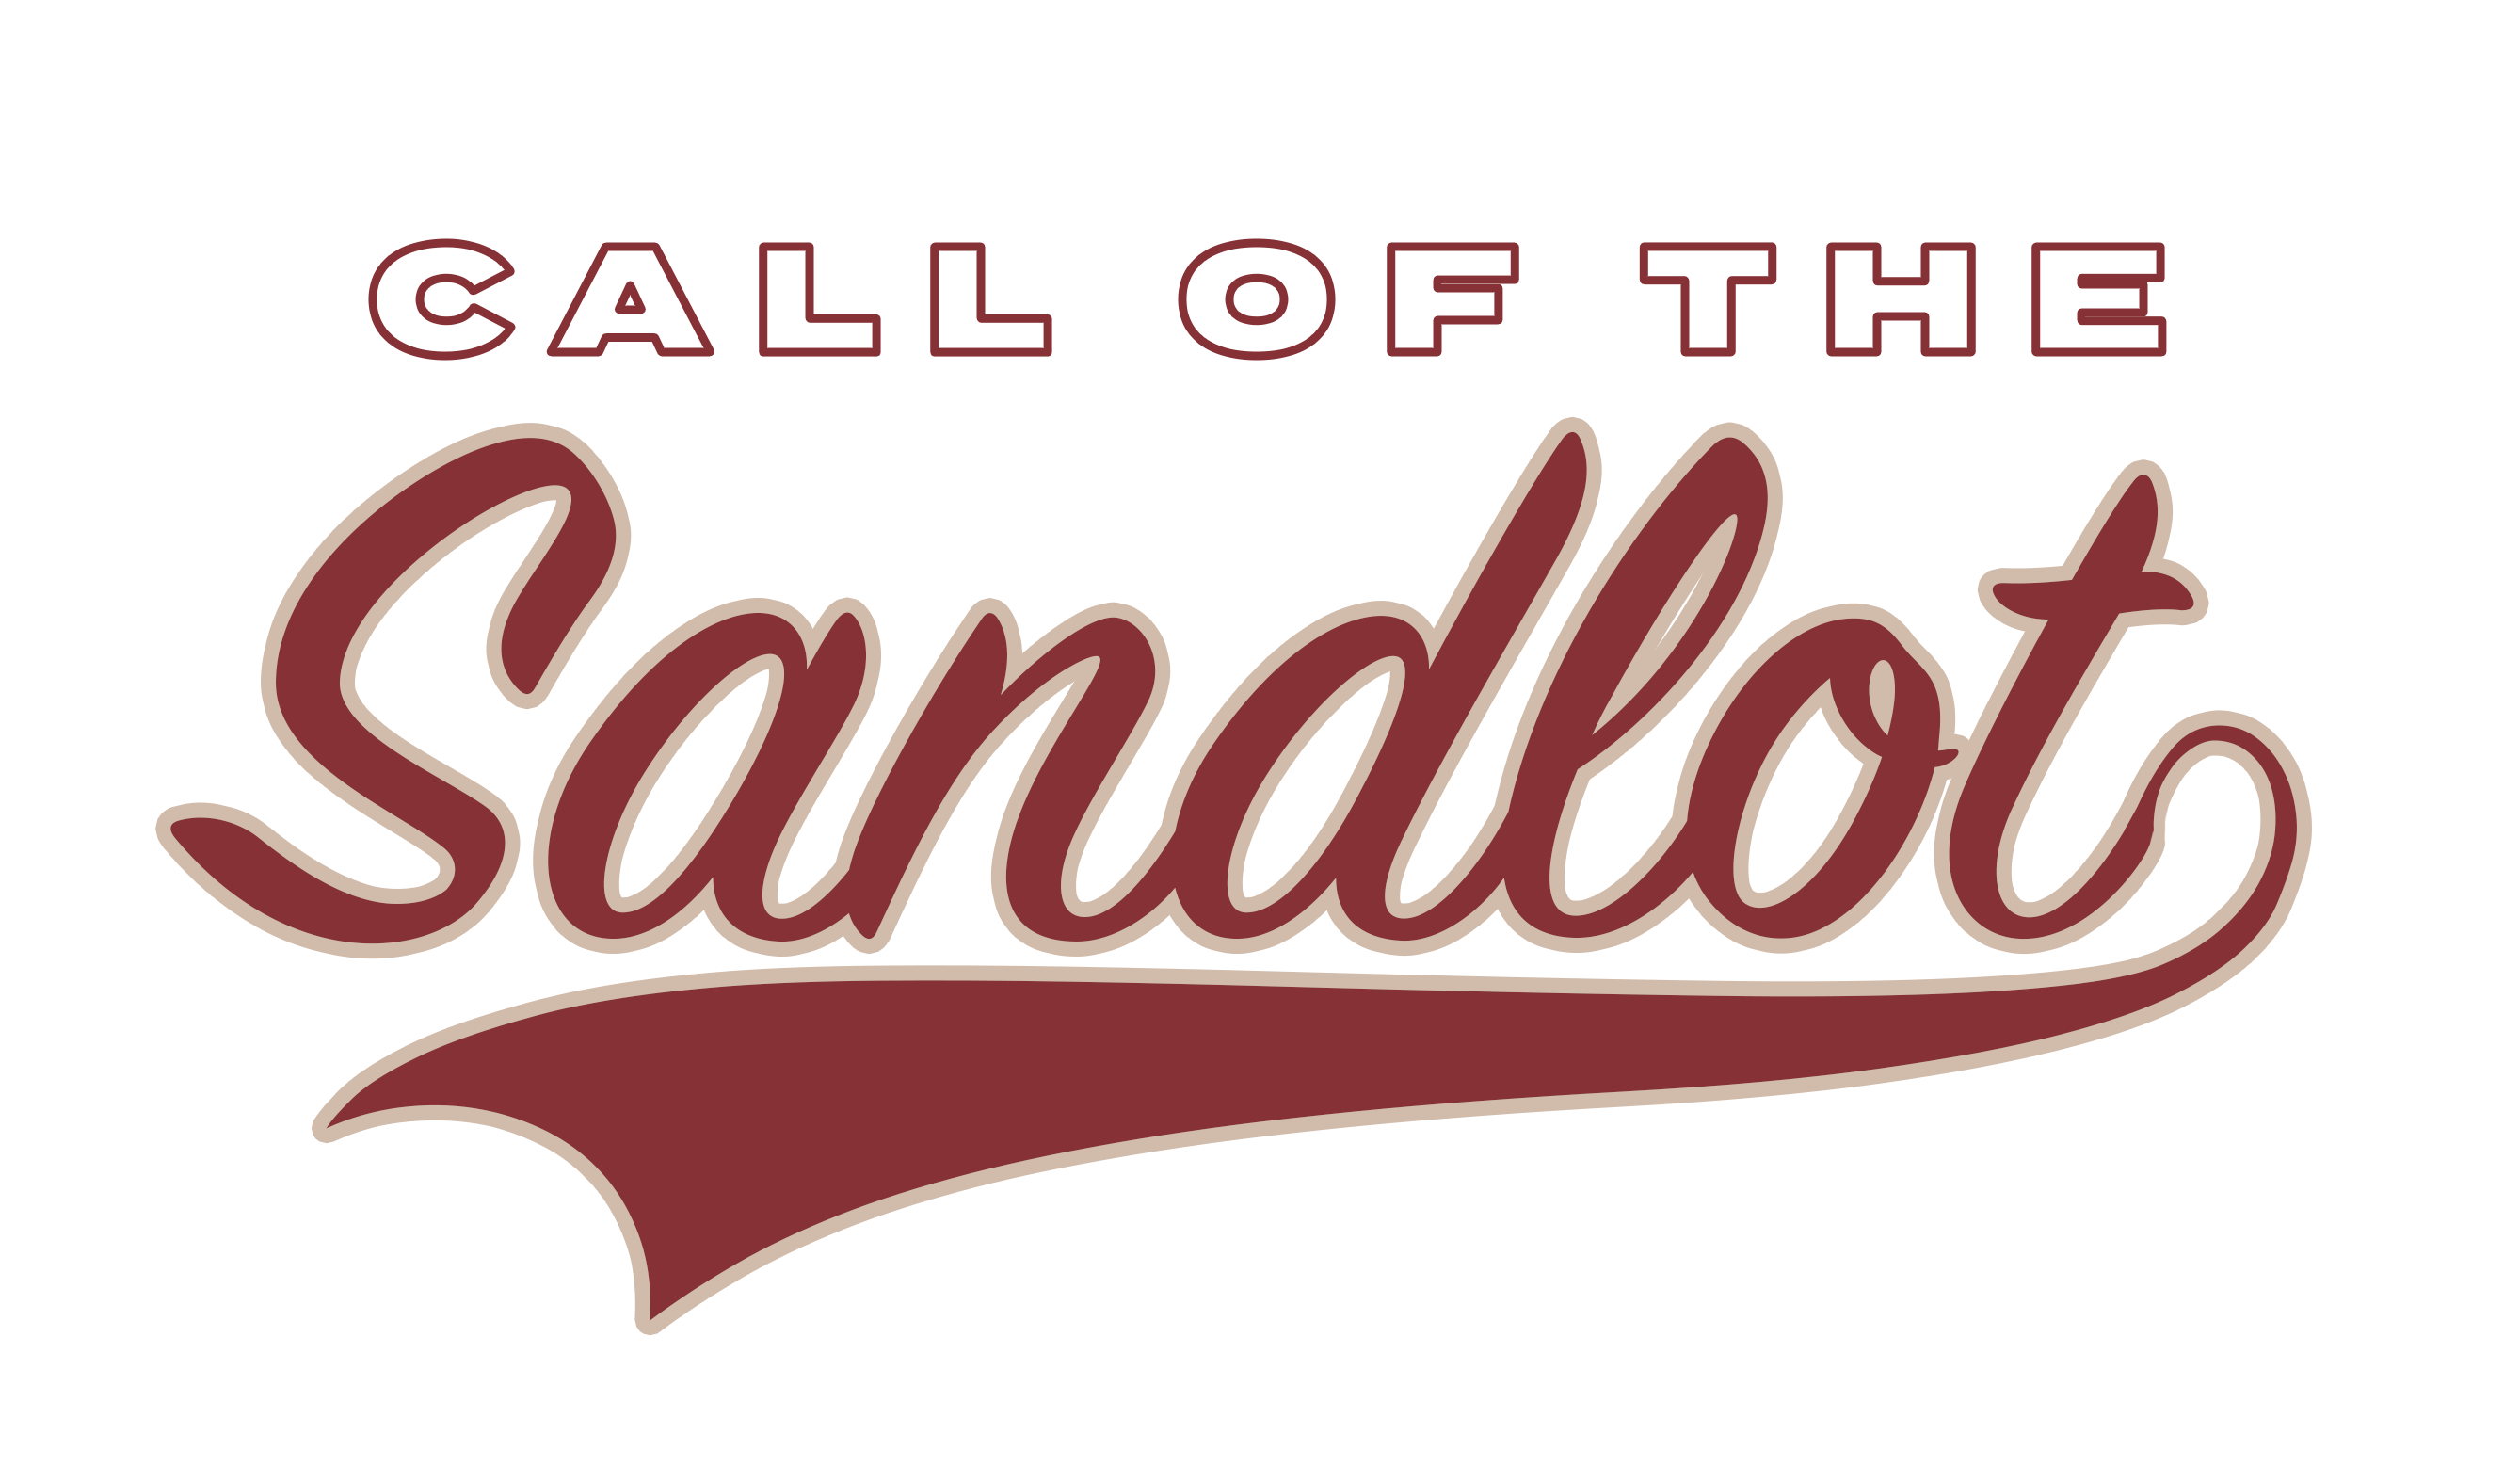 Call Of The Sandlot